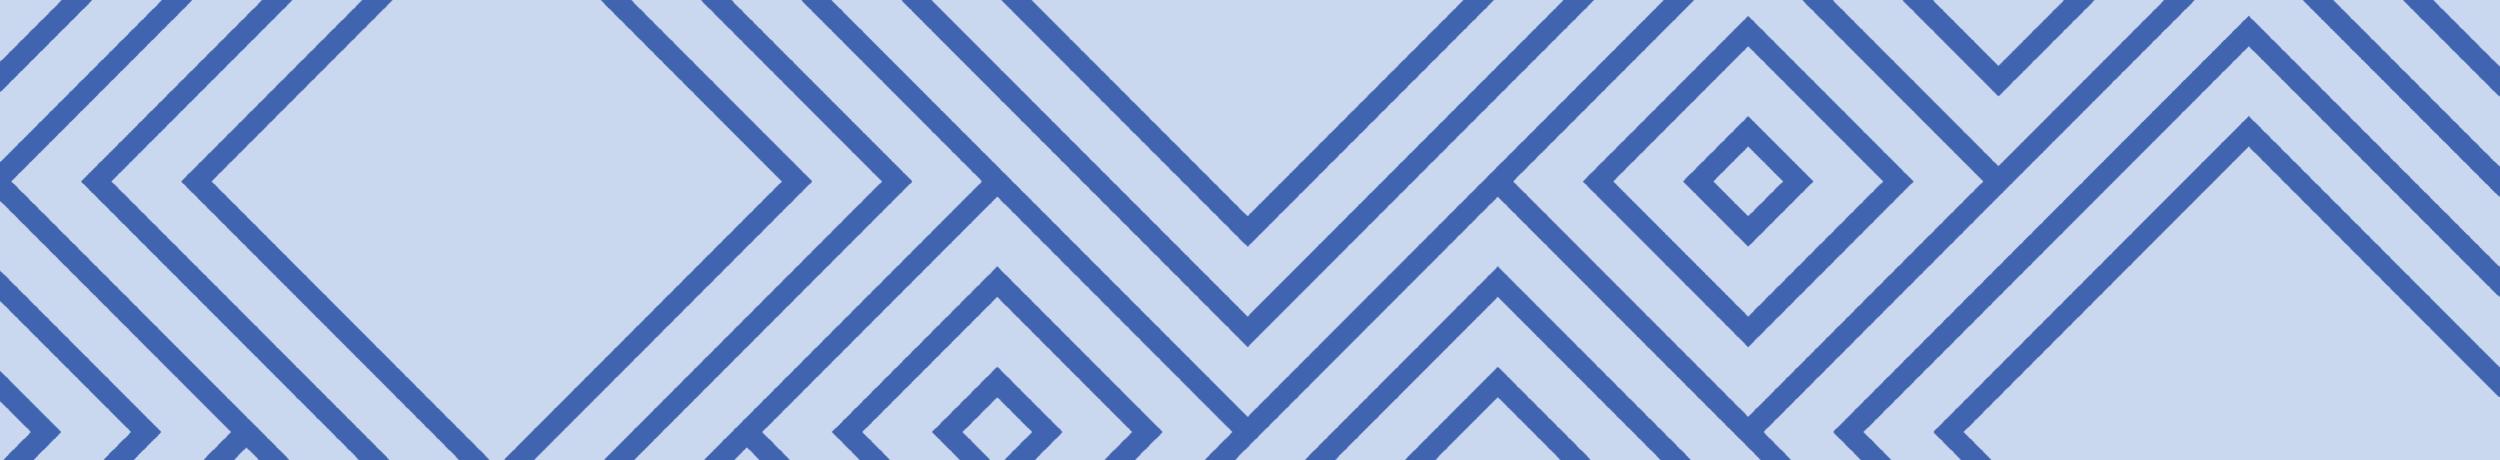 CaseStudyBrandBoard_HapnerHart_Template_1_Intro Pattern.jpg